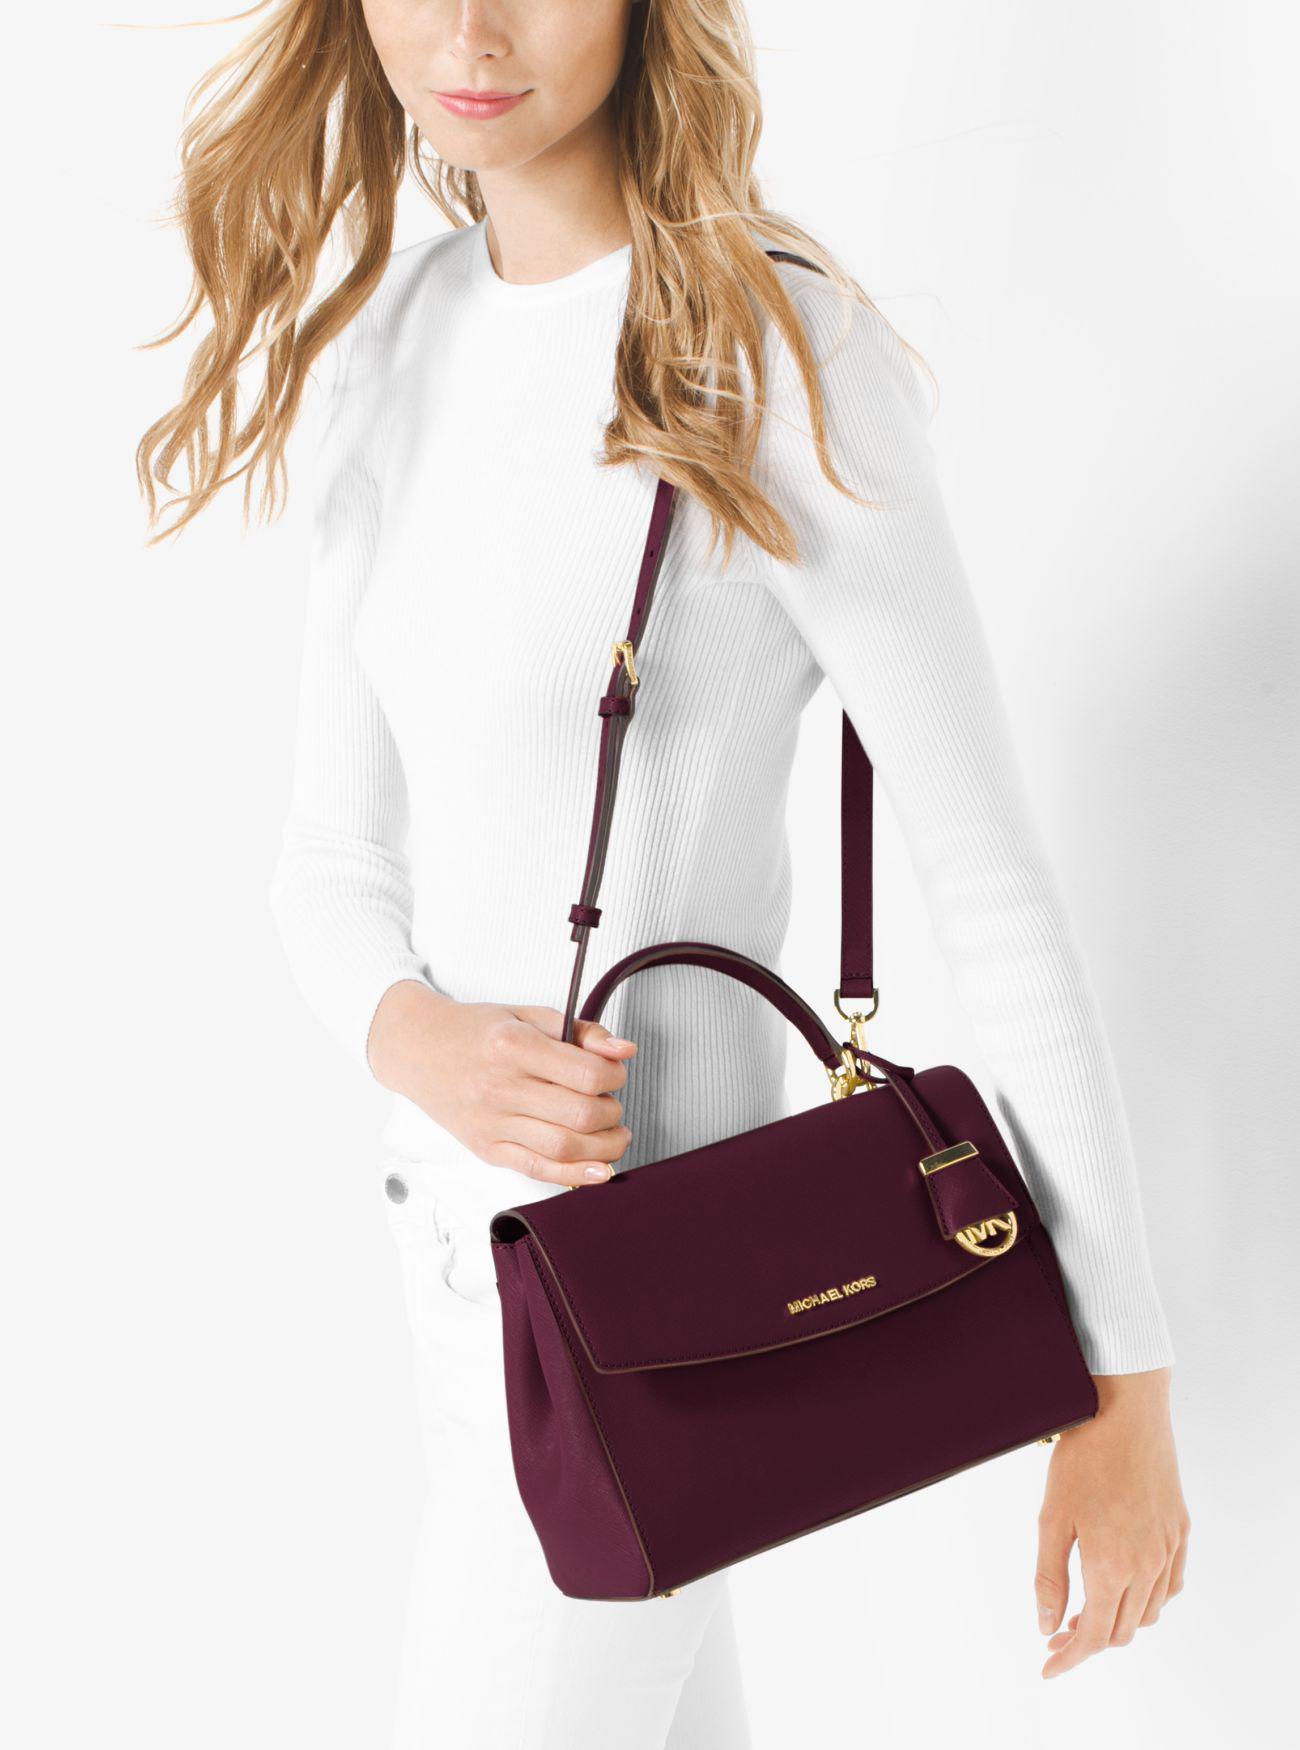 4260456c8904 Womens Michael Kors ... Michael kors Ava Small Plum Saffiano Leather  Satchel Bag Ly NWT NEW Michael Kors Saffiano ...